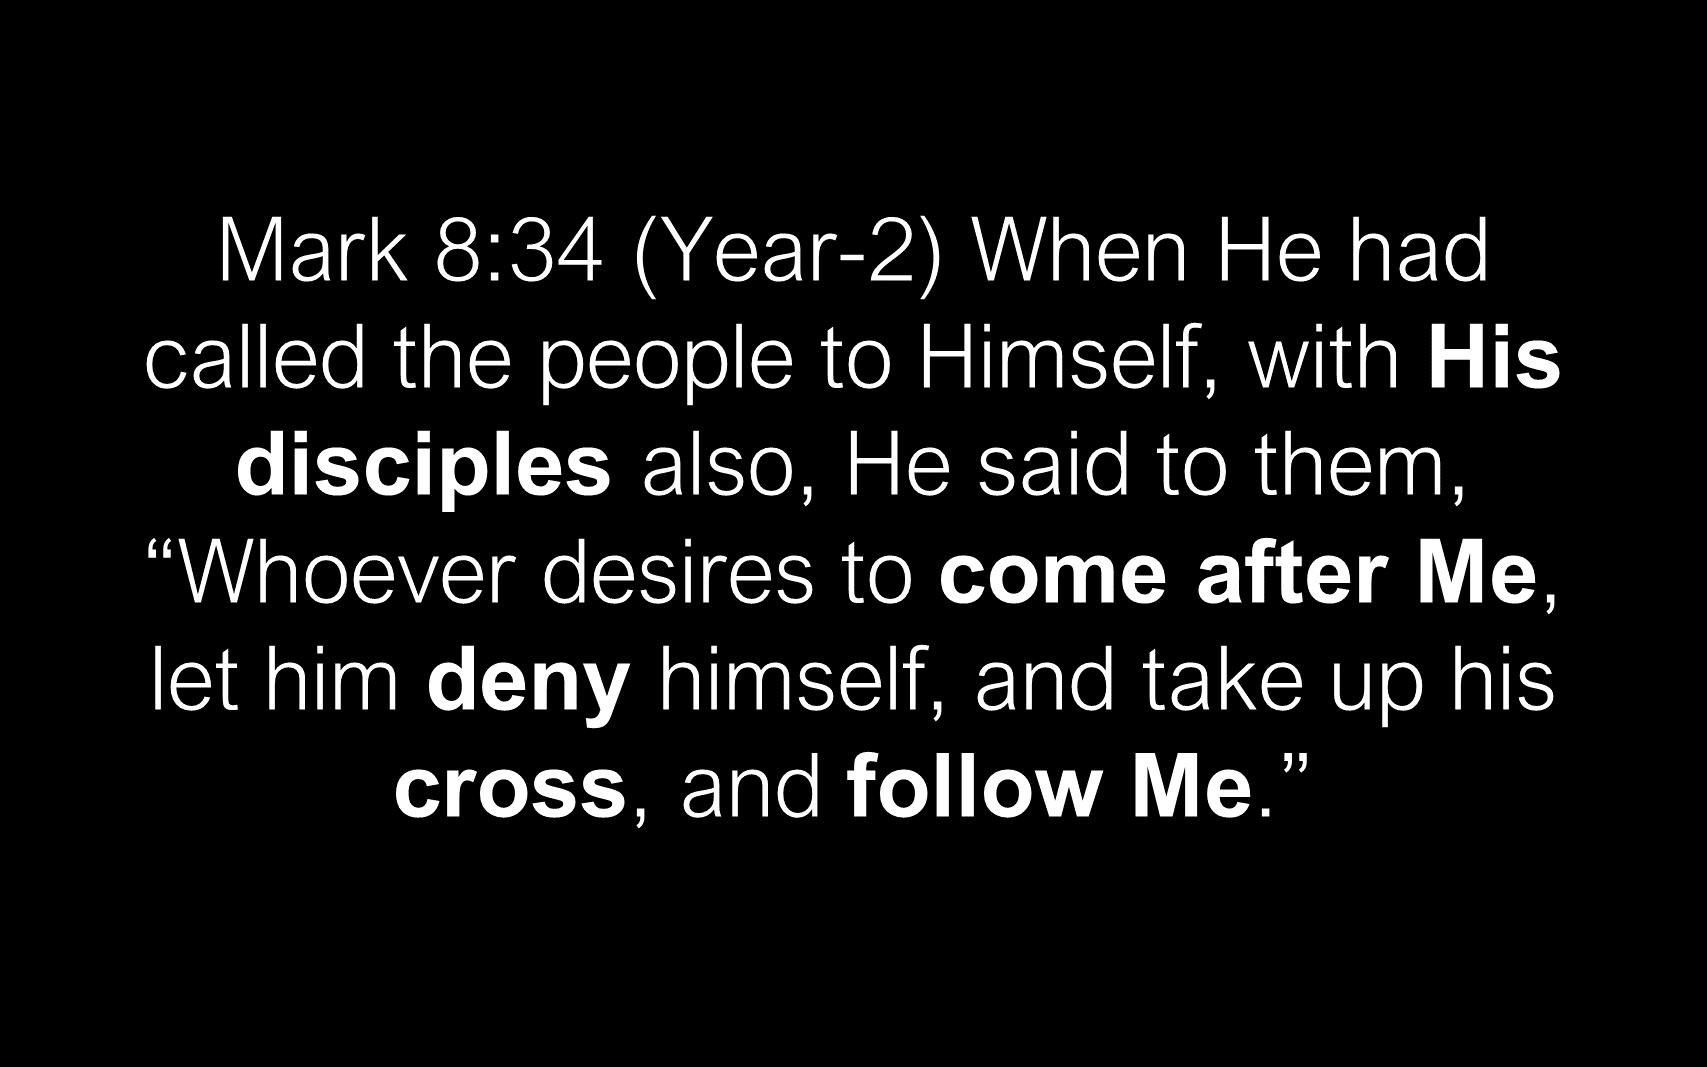 ESH-11 - The Discipline Of Disciple-Making - Disciples - Follow Christ & Make Disciples (10)